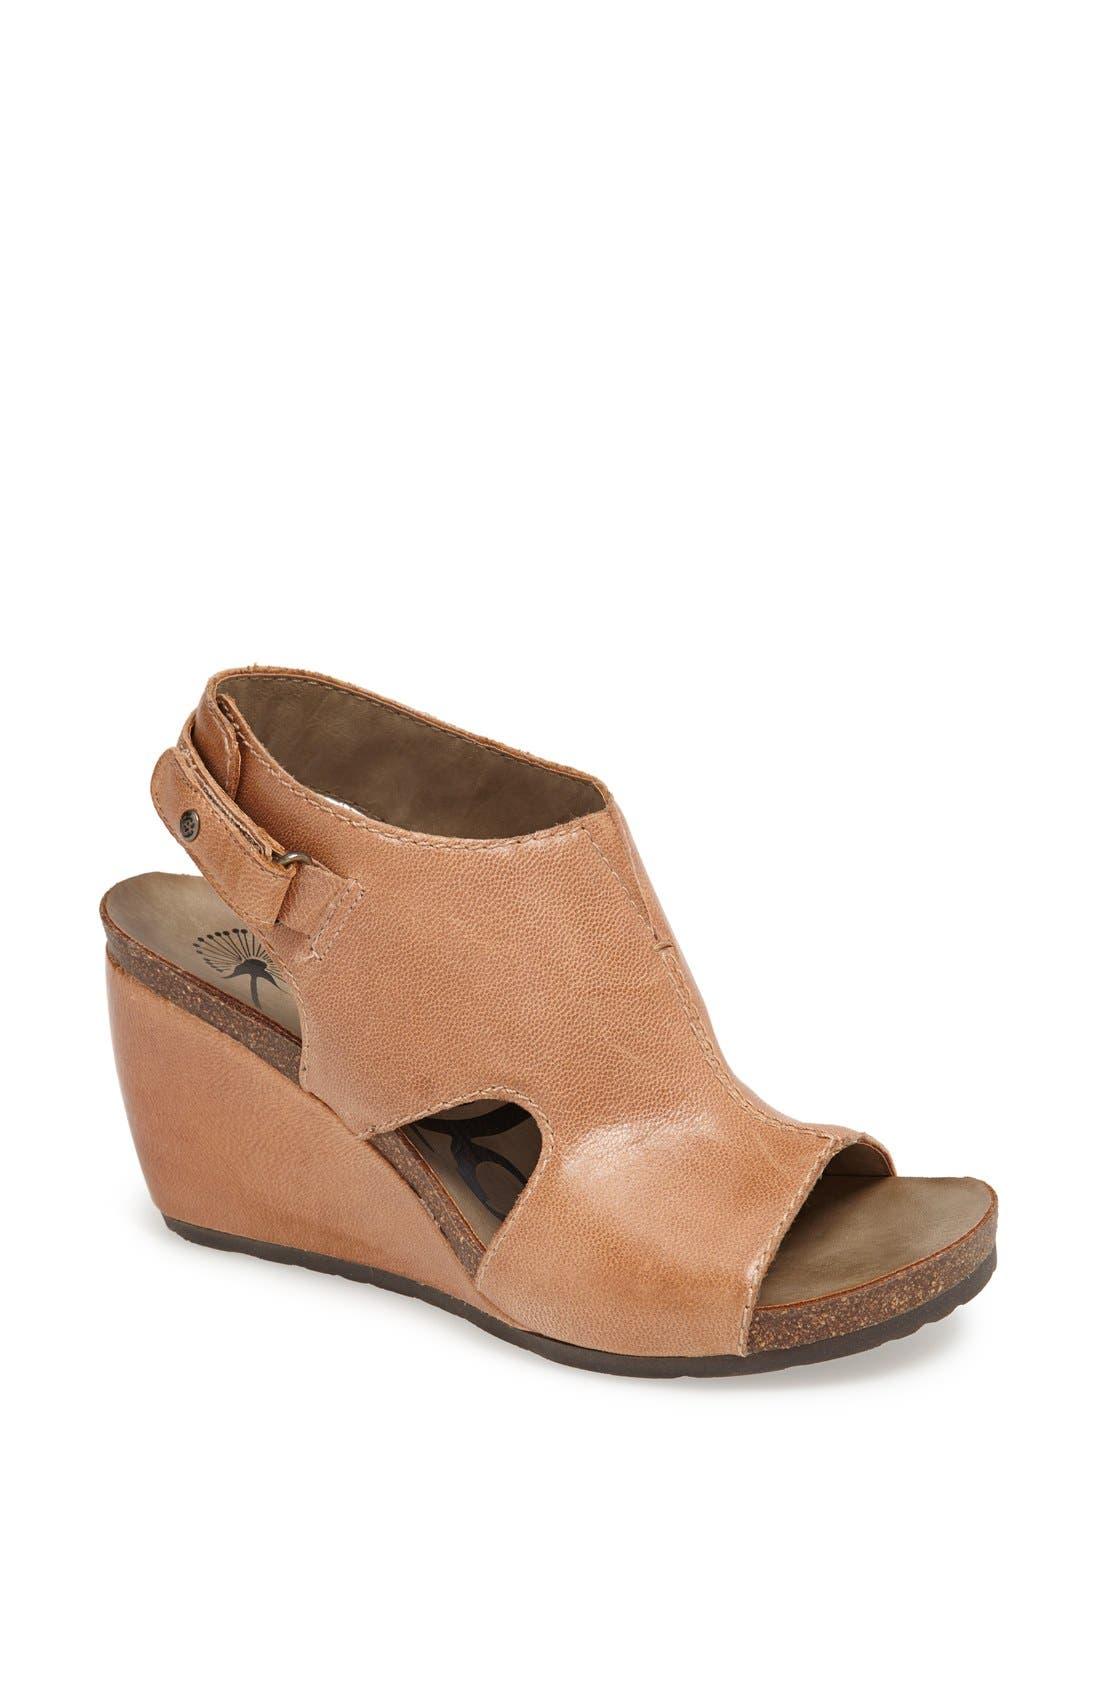 Alternate Image 1 Selected - OTBT 'Laketown' Sandal